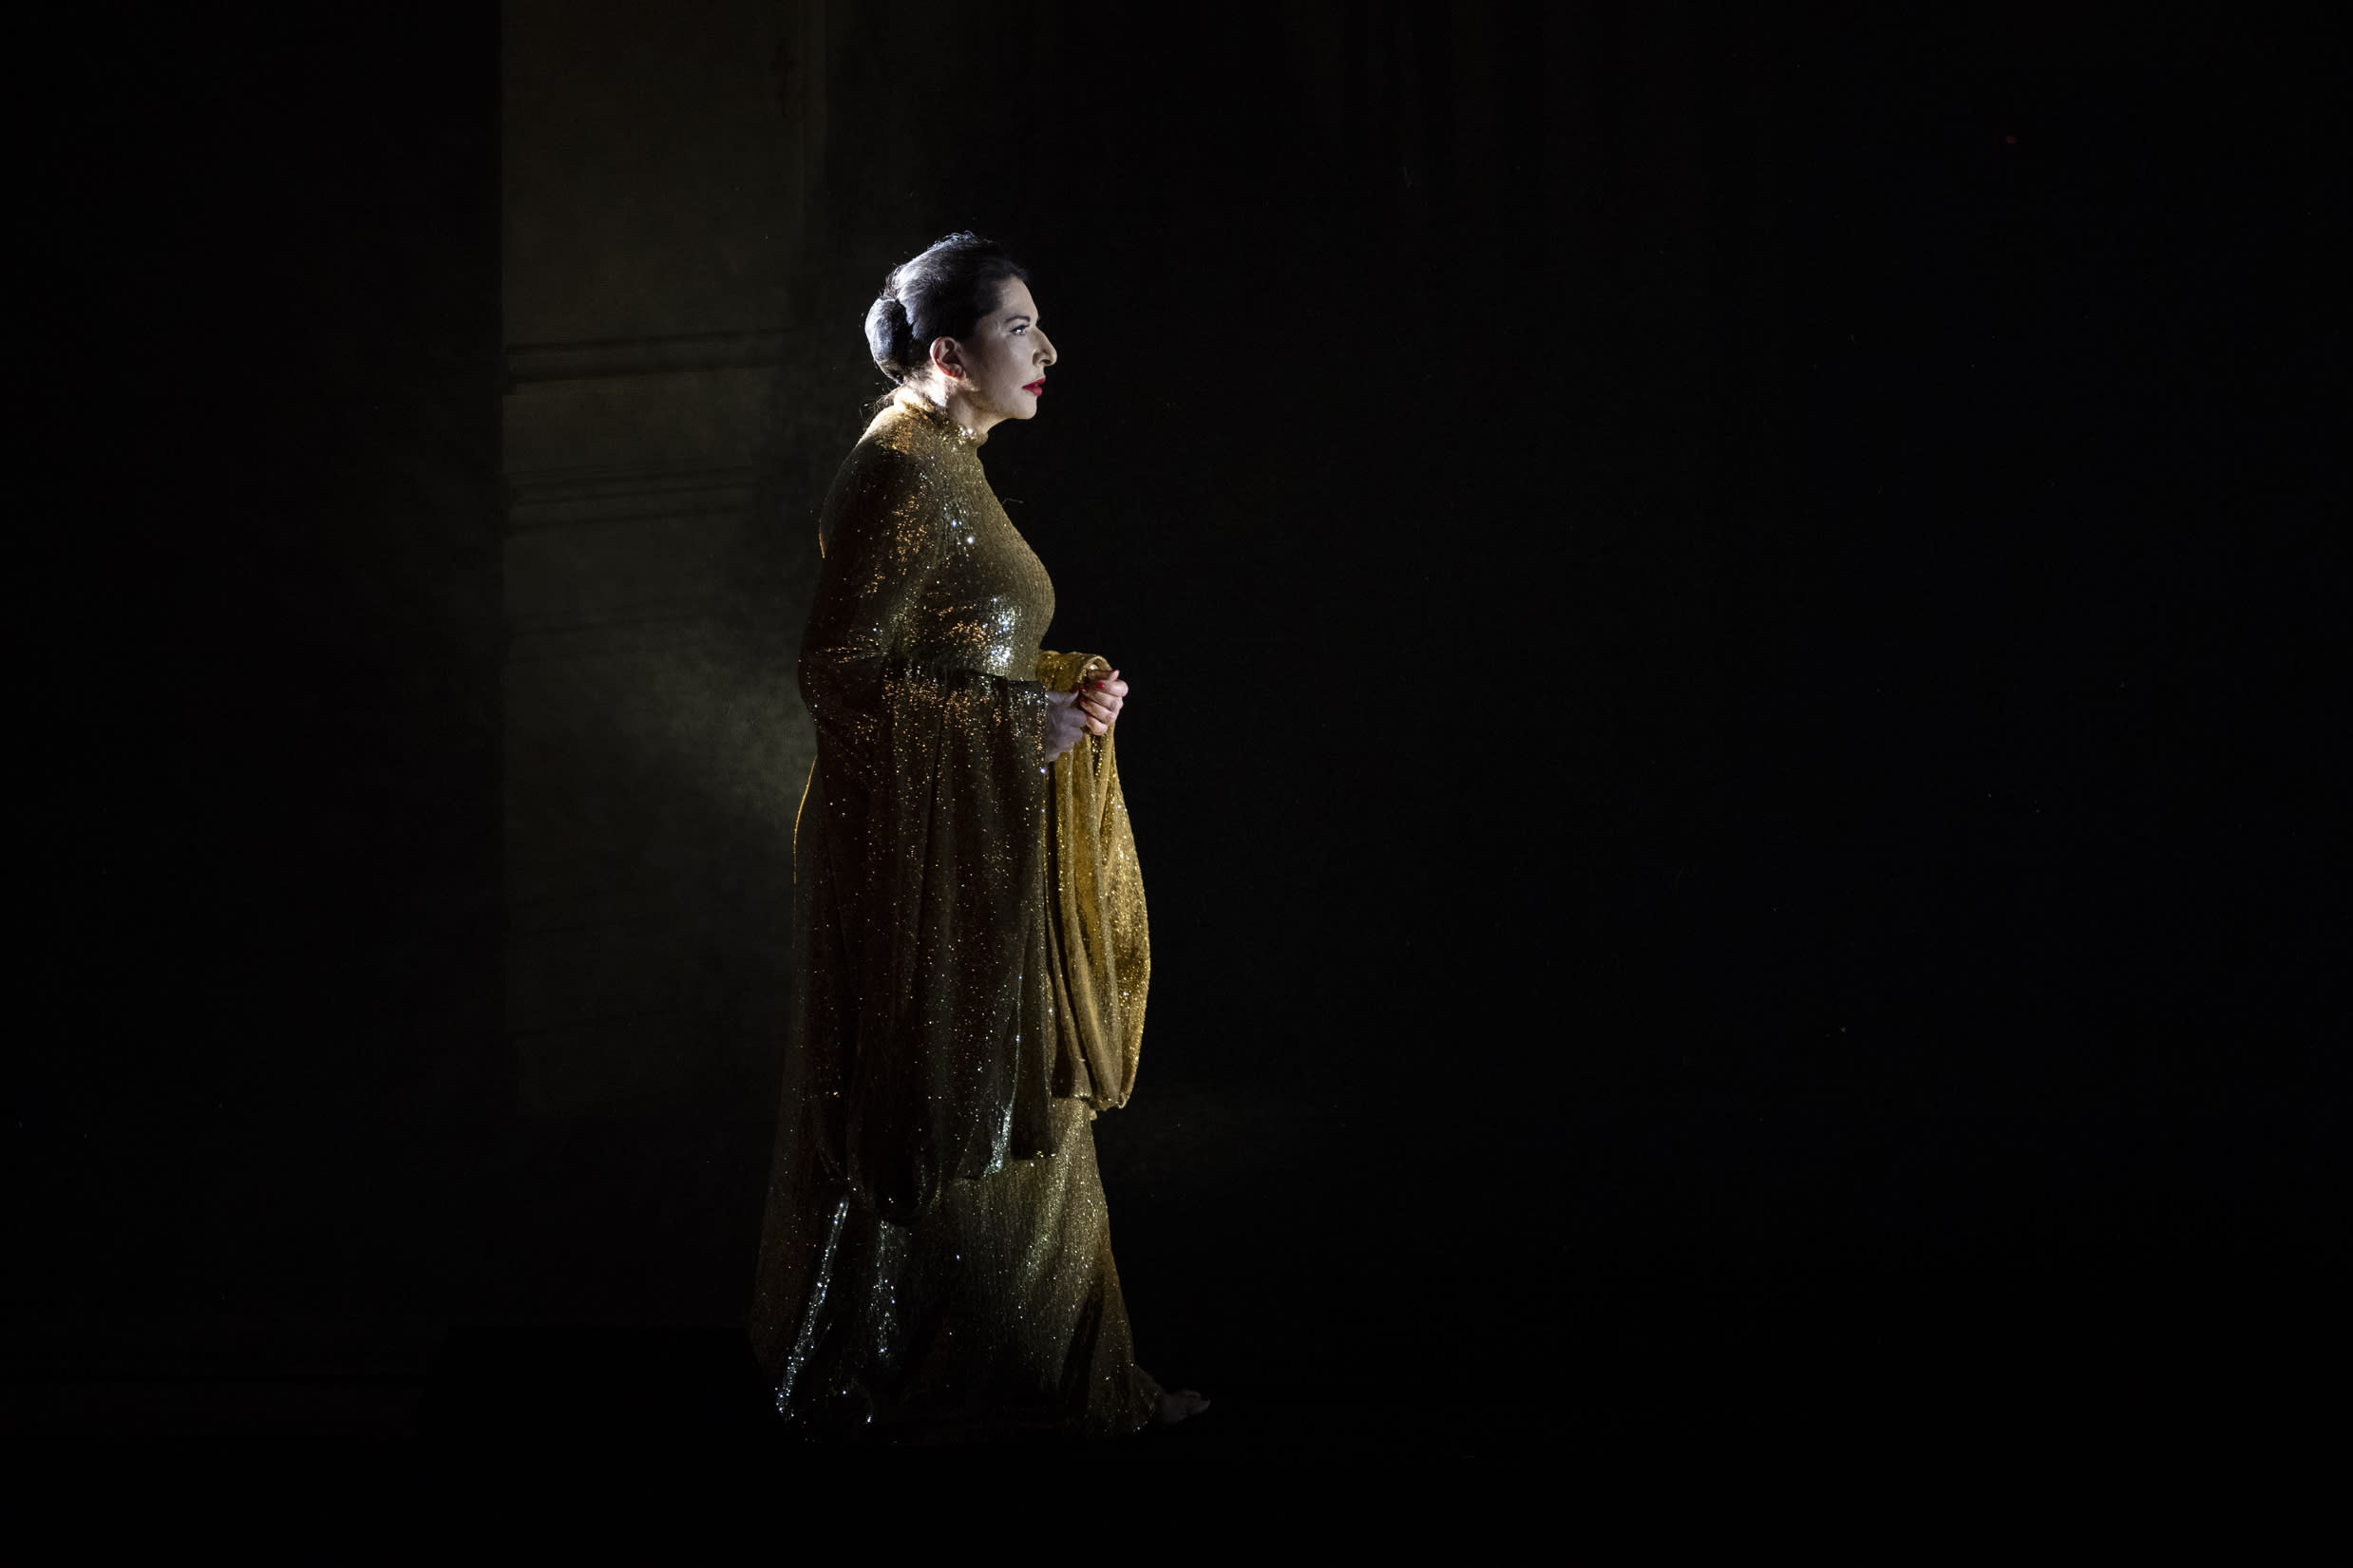 7 Deaths of Maria Callas 21-22 © Charles Duprat - OnP (23)